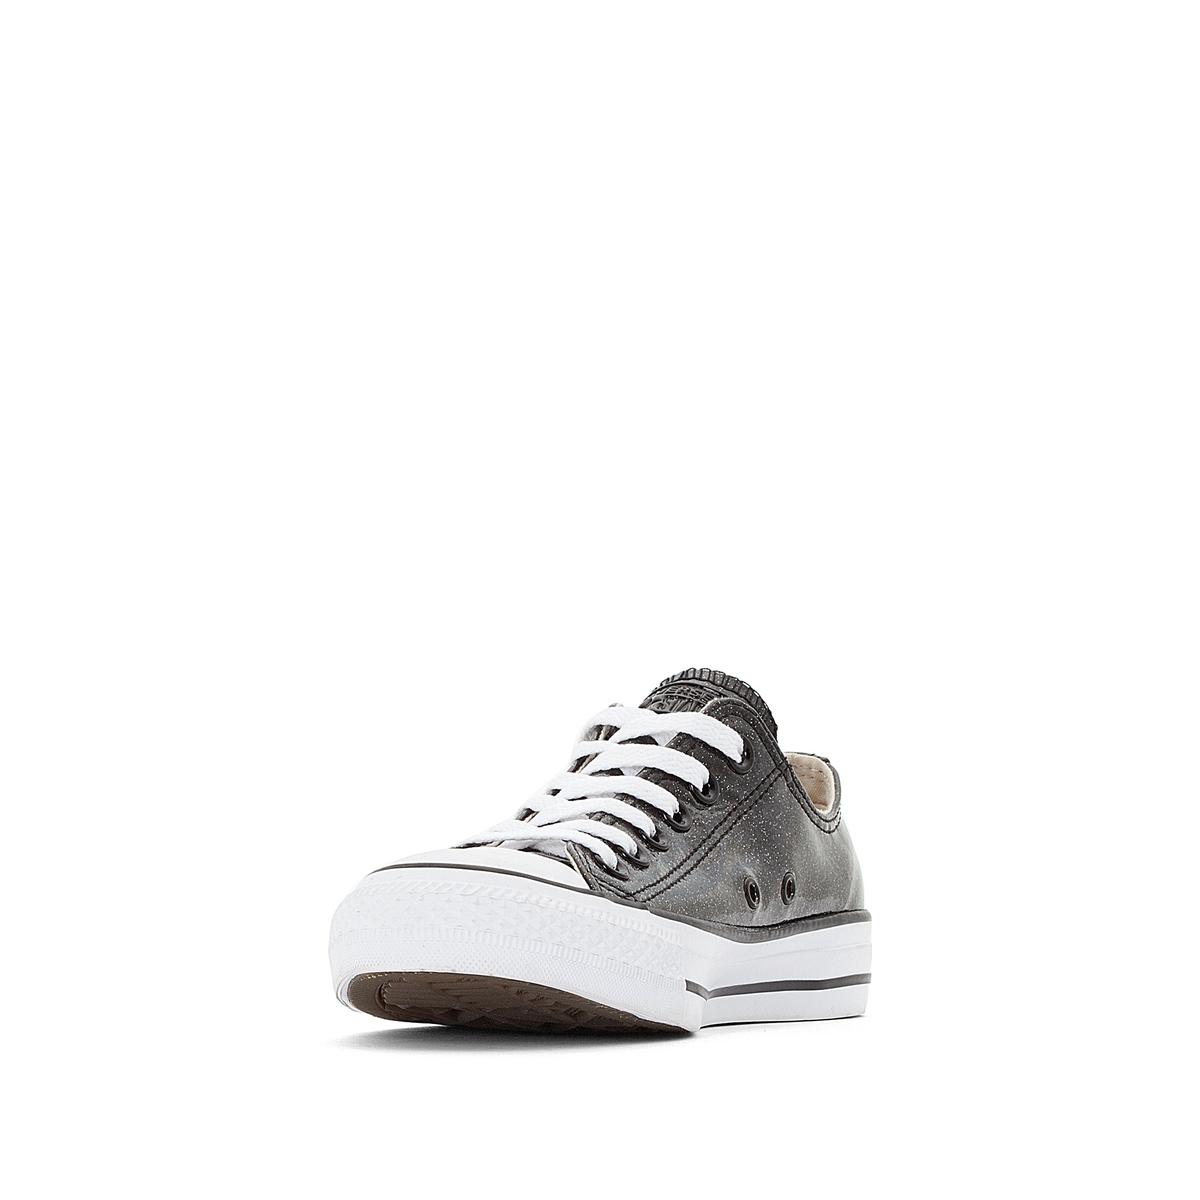 Imagen secundaria de producto de Zapatillas deportivas Chuck Taylor All Star - Converse